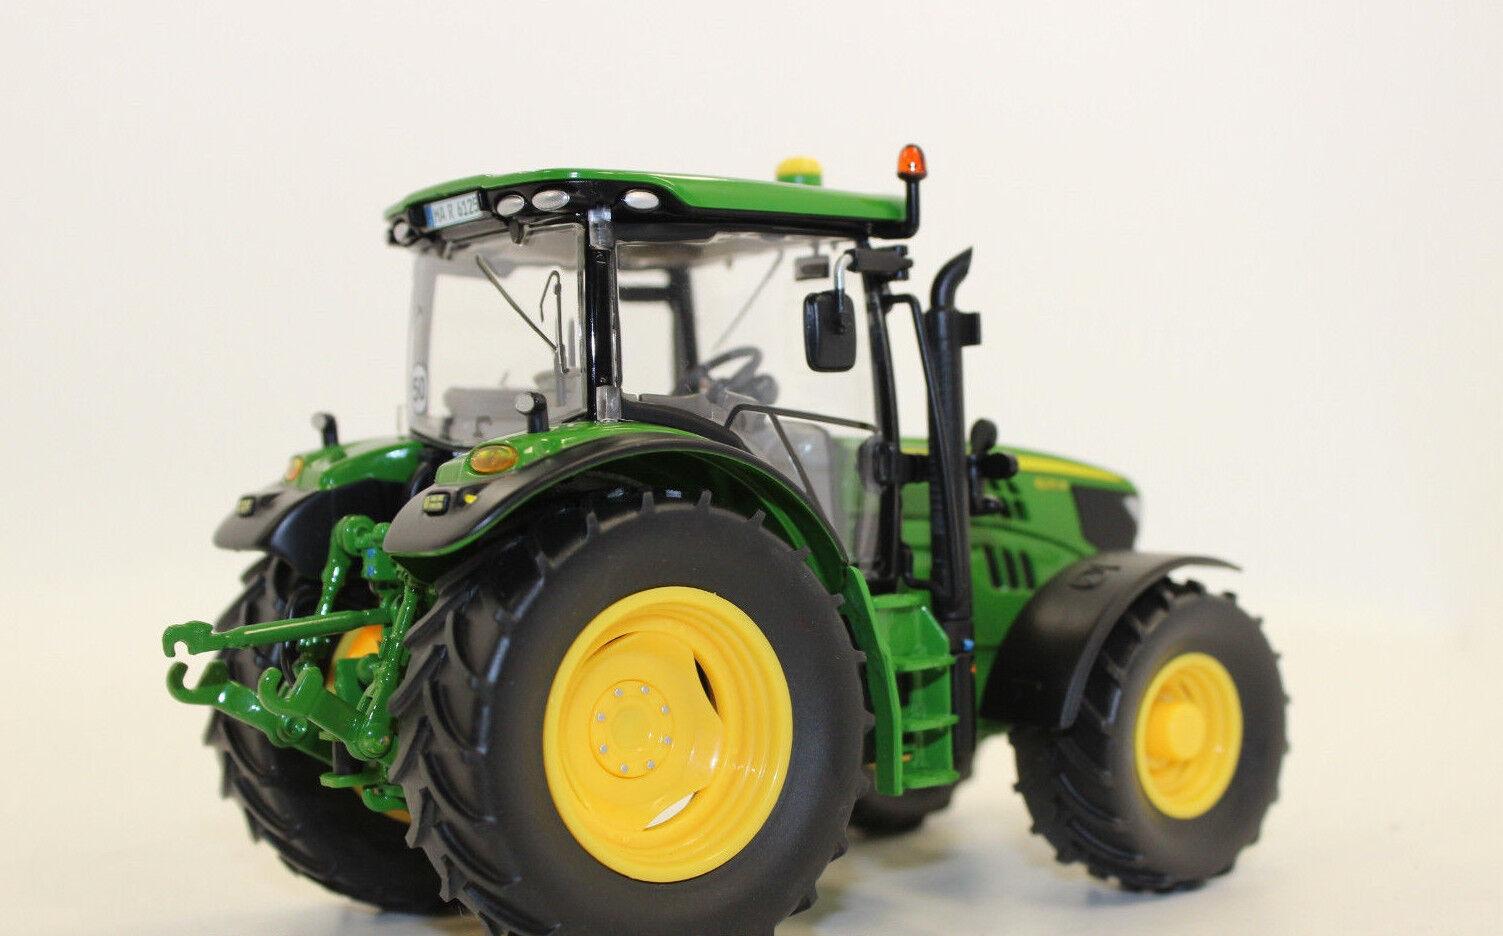 Wiking 773 18 18 18 John Deere 6125R Traktor 077318   1 32 NEU in OVP    Deutschland Frankfurt  9184cb